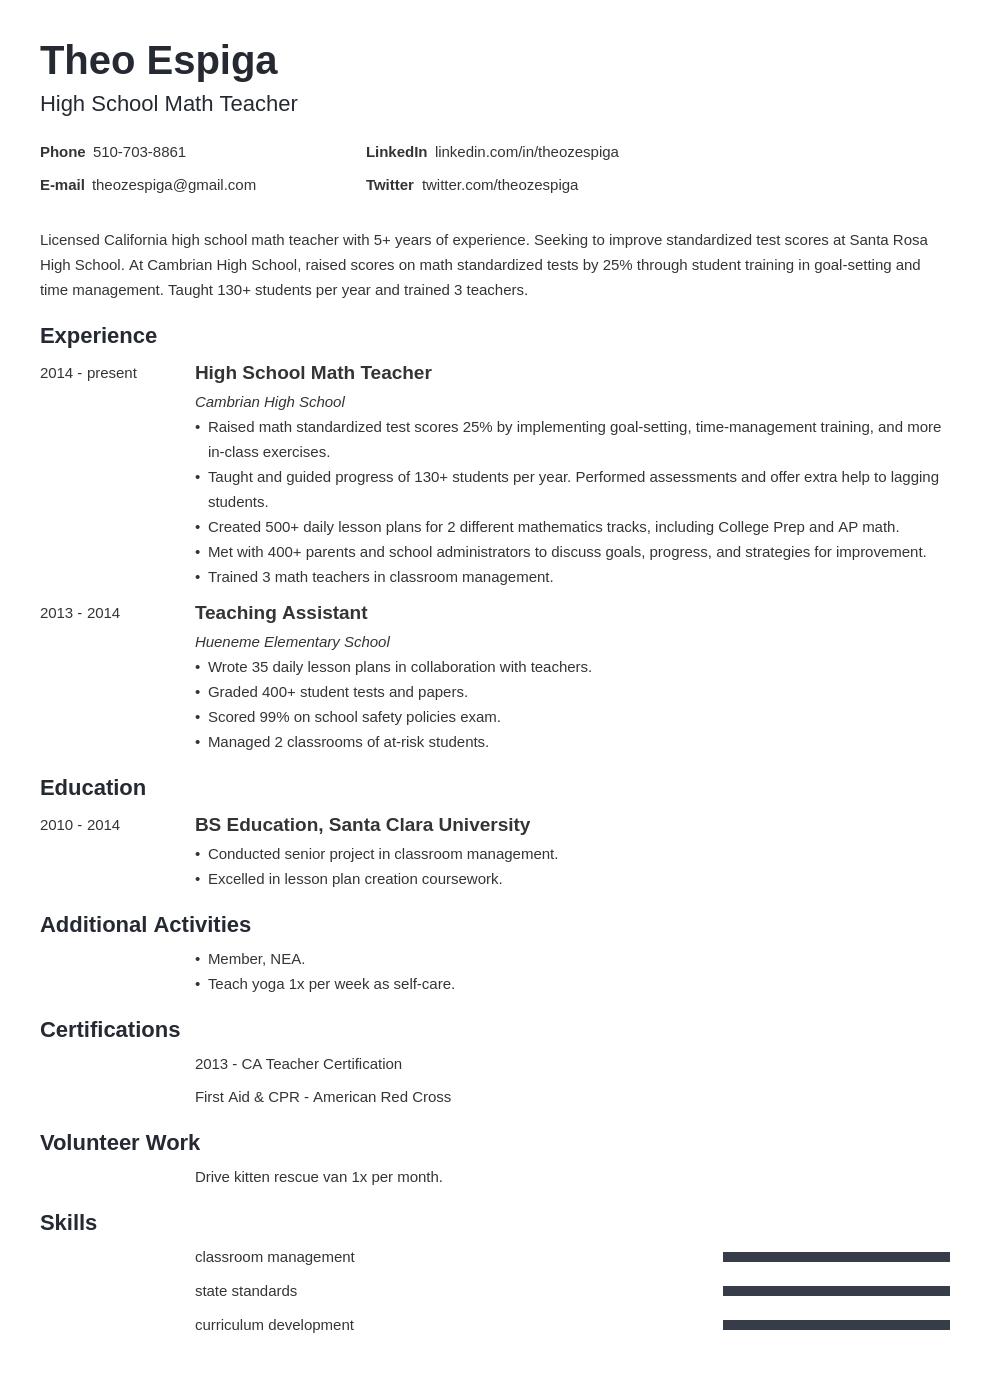 education template minimo uk